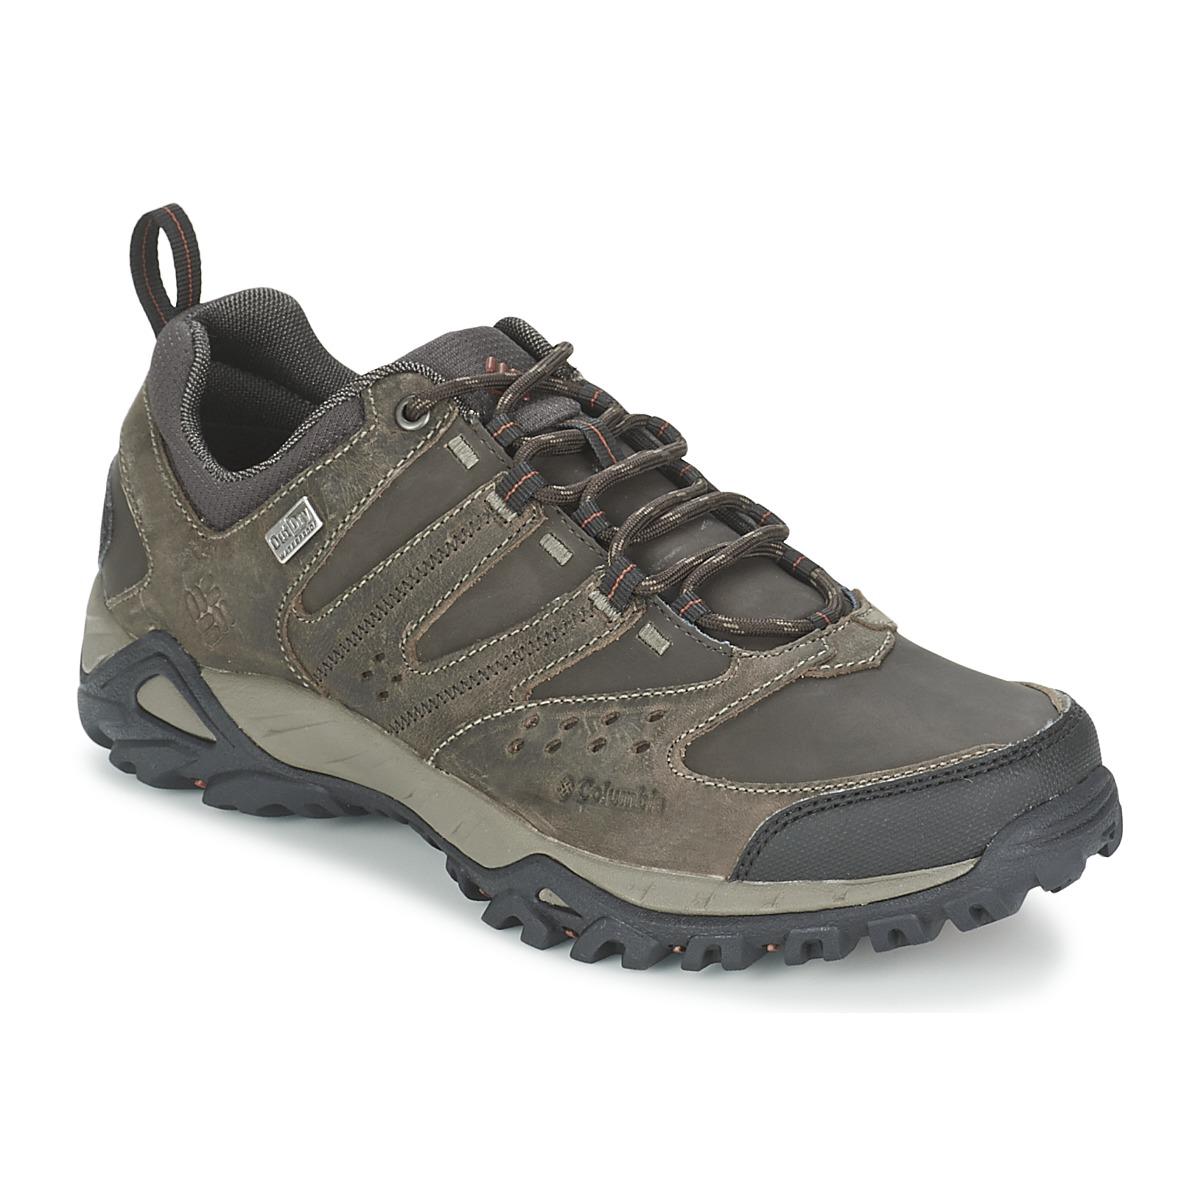 Chaussures-de-randonnee Columbia PEAKFREAK XCRSN LEATHER OUTDRY Terre